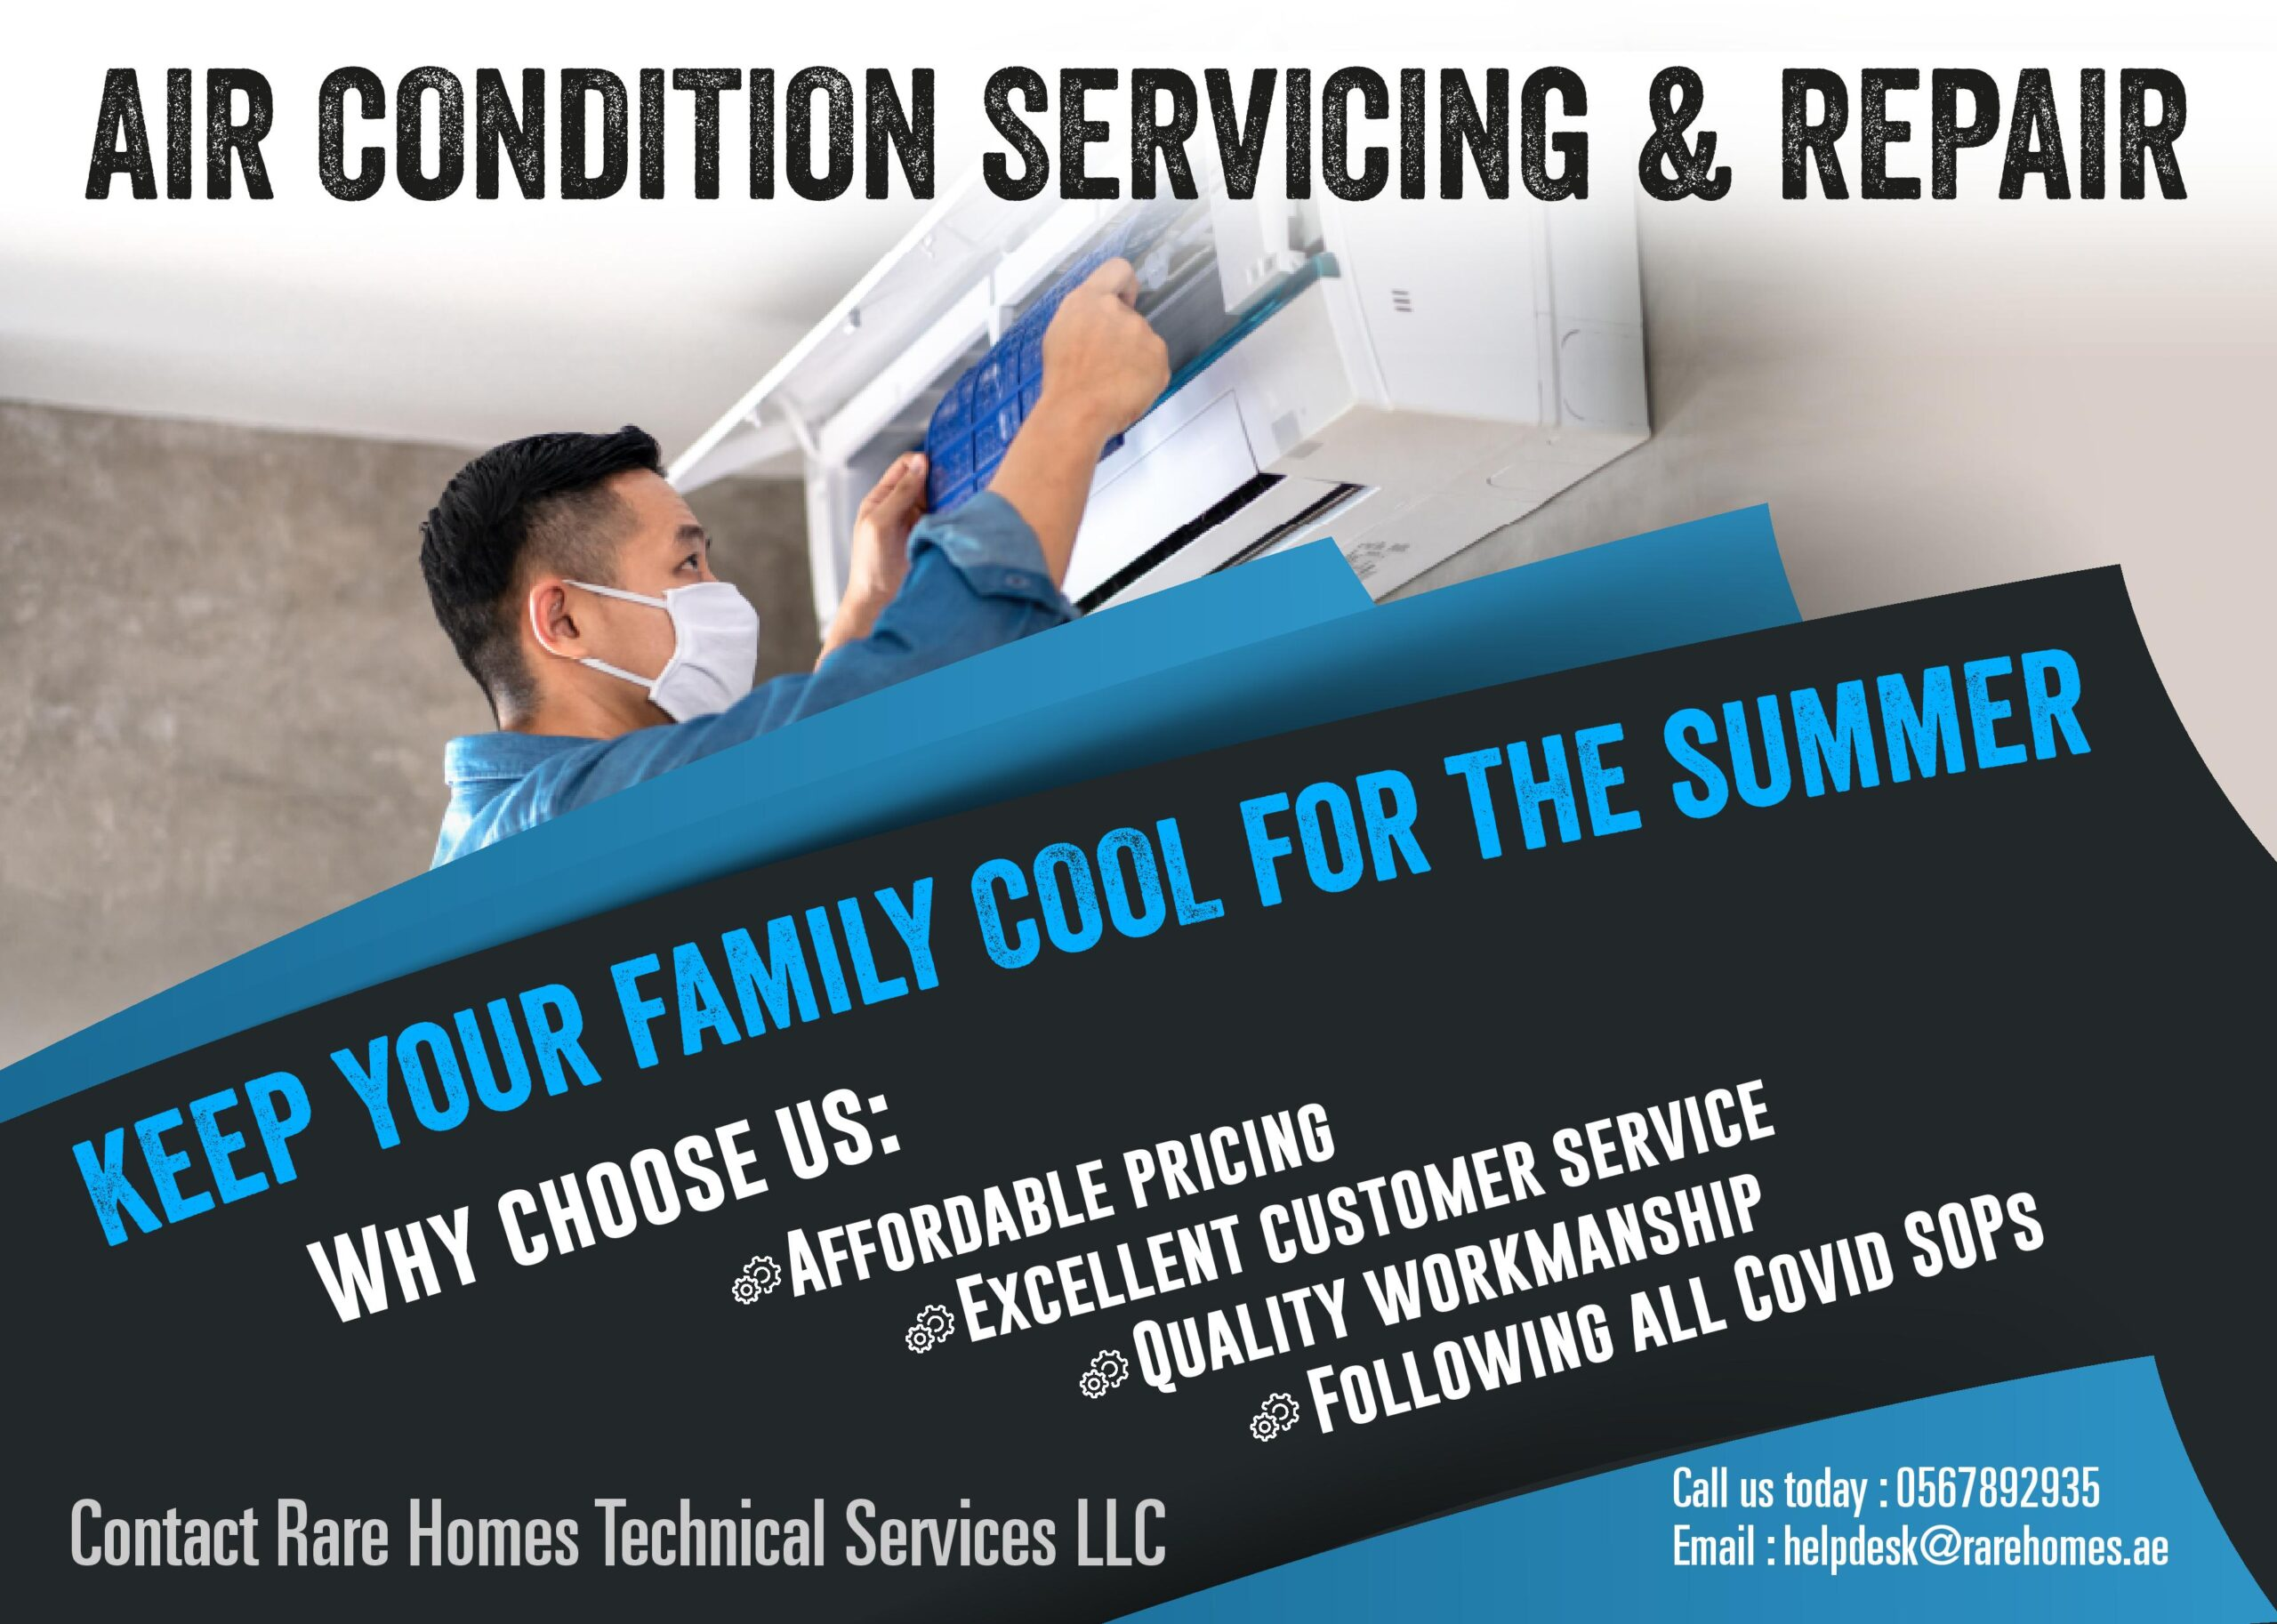 RARE HOMES   TECHNICAL SERVICE LLC 001.jpg